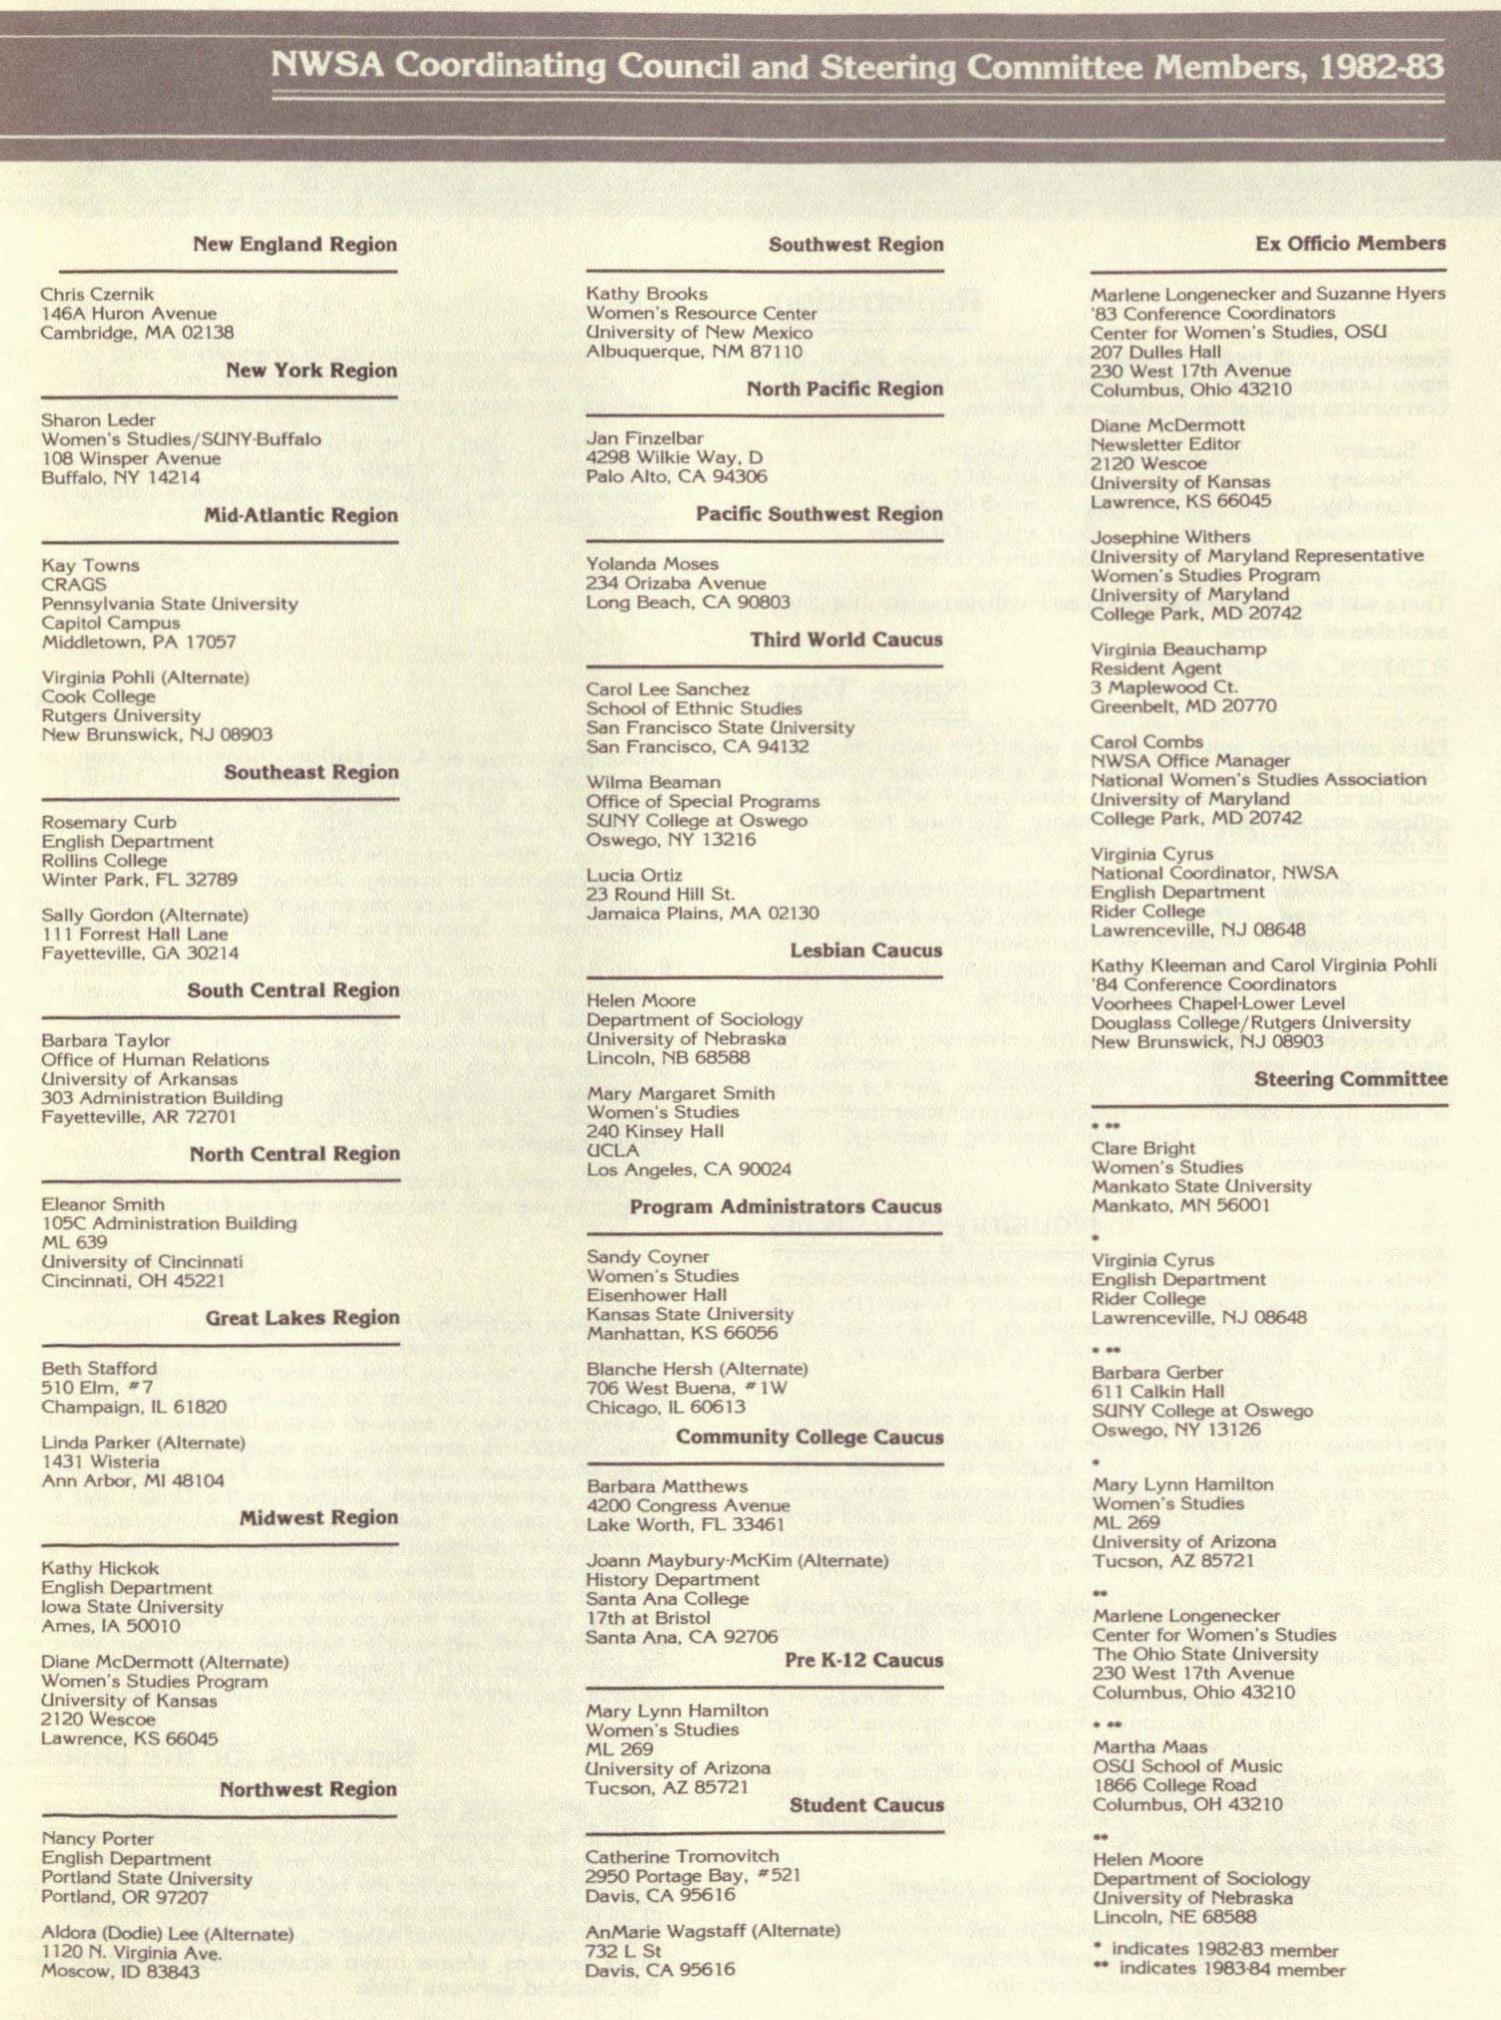 1983 Coordinating Council Members